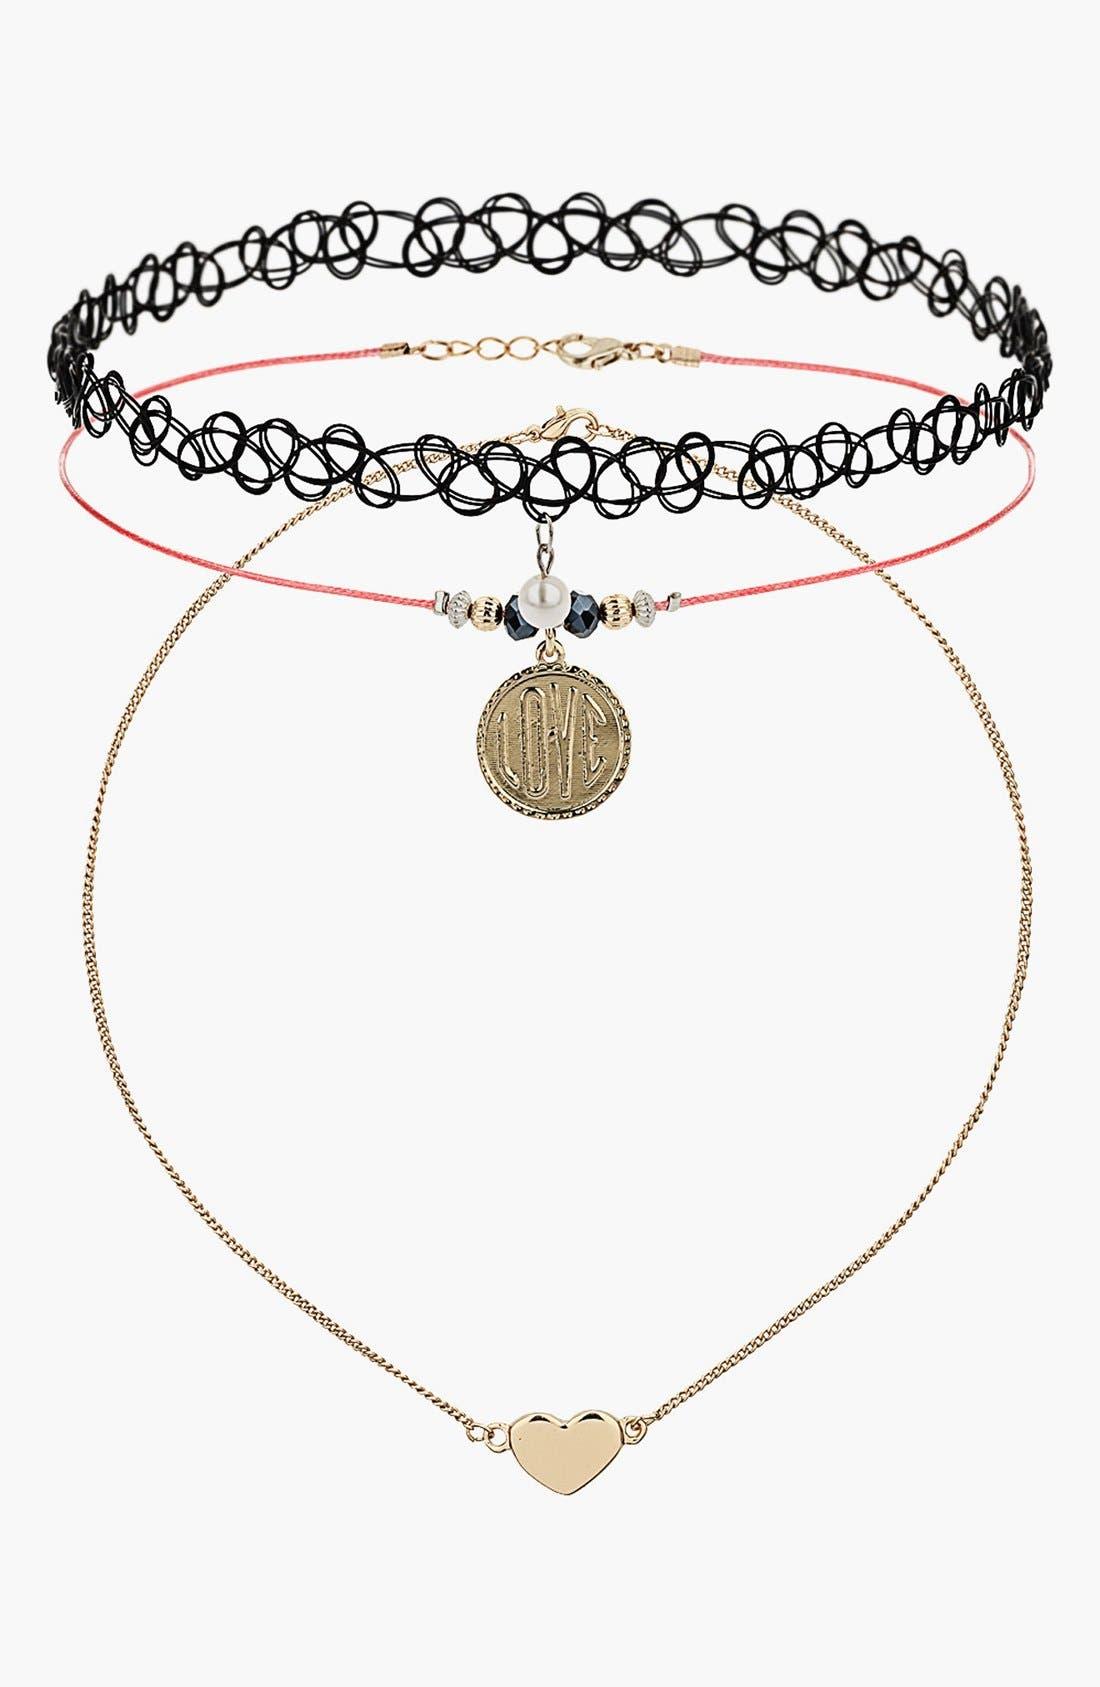 Main Image - Topshop Love Charm Choker & Necklace Set